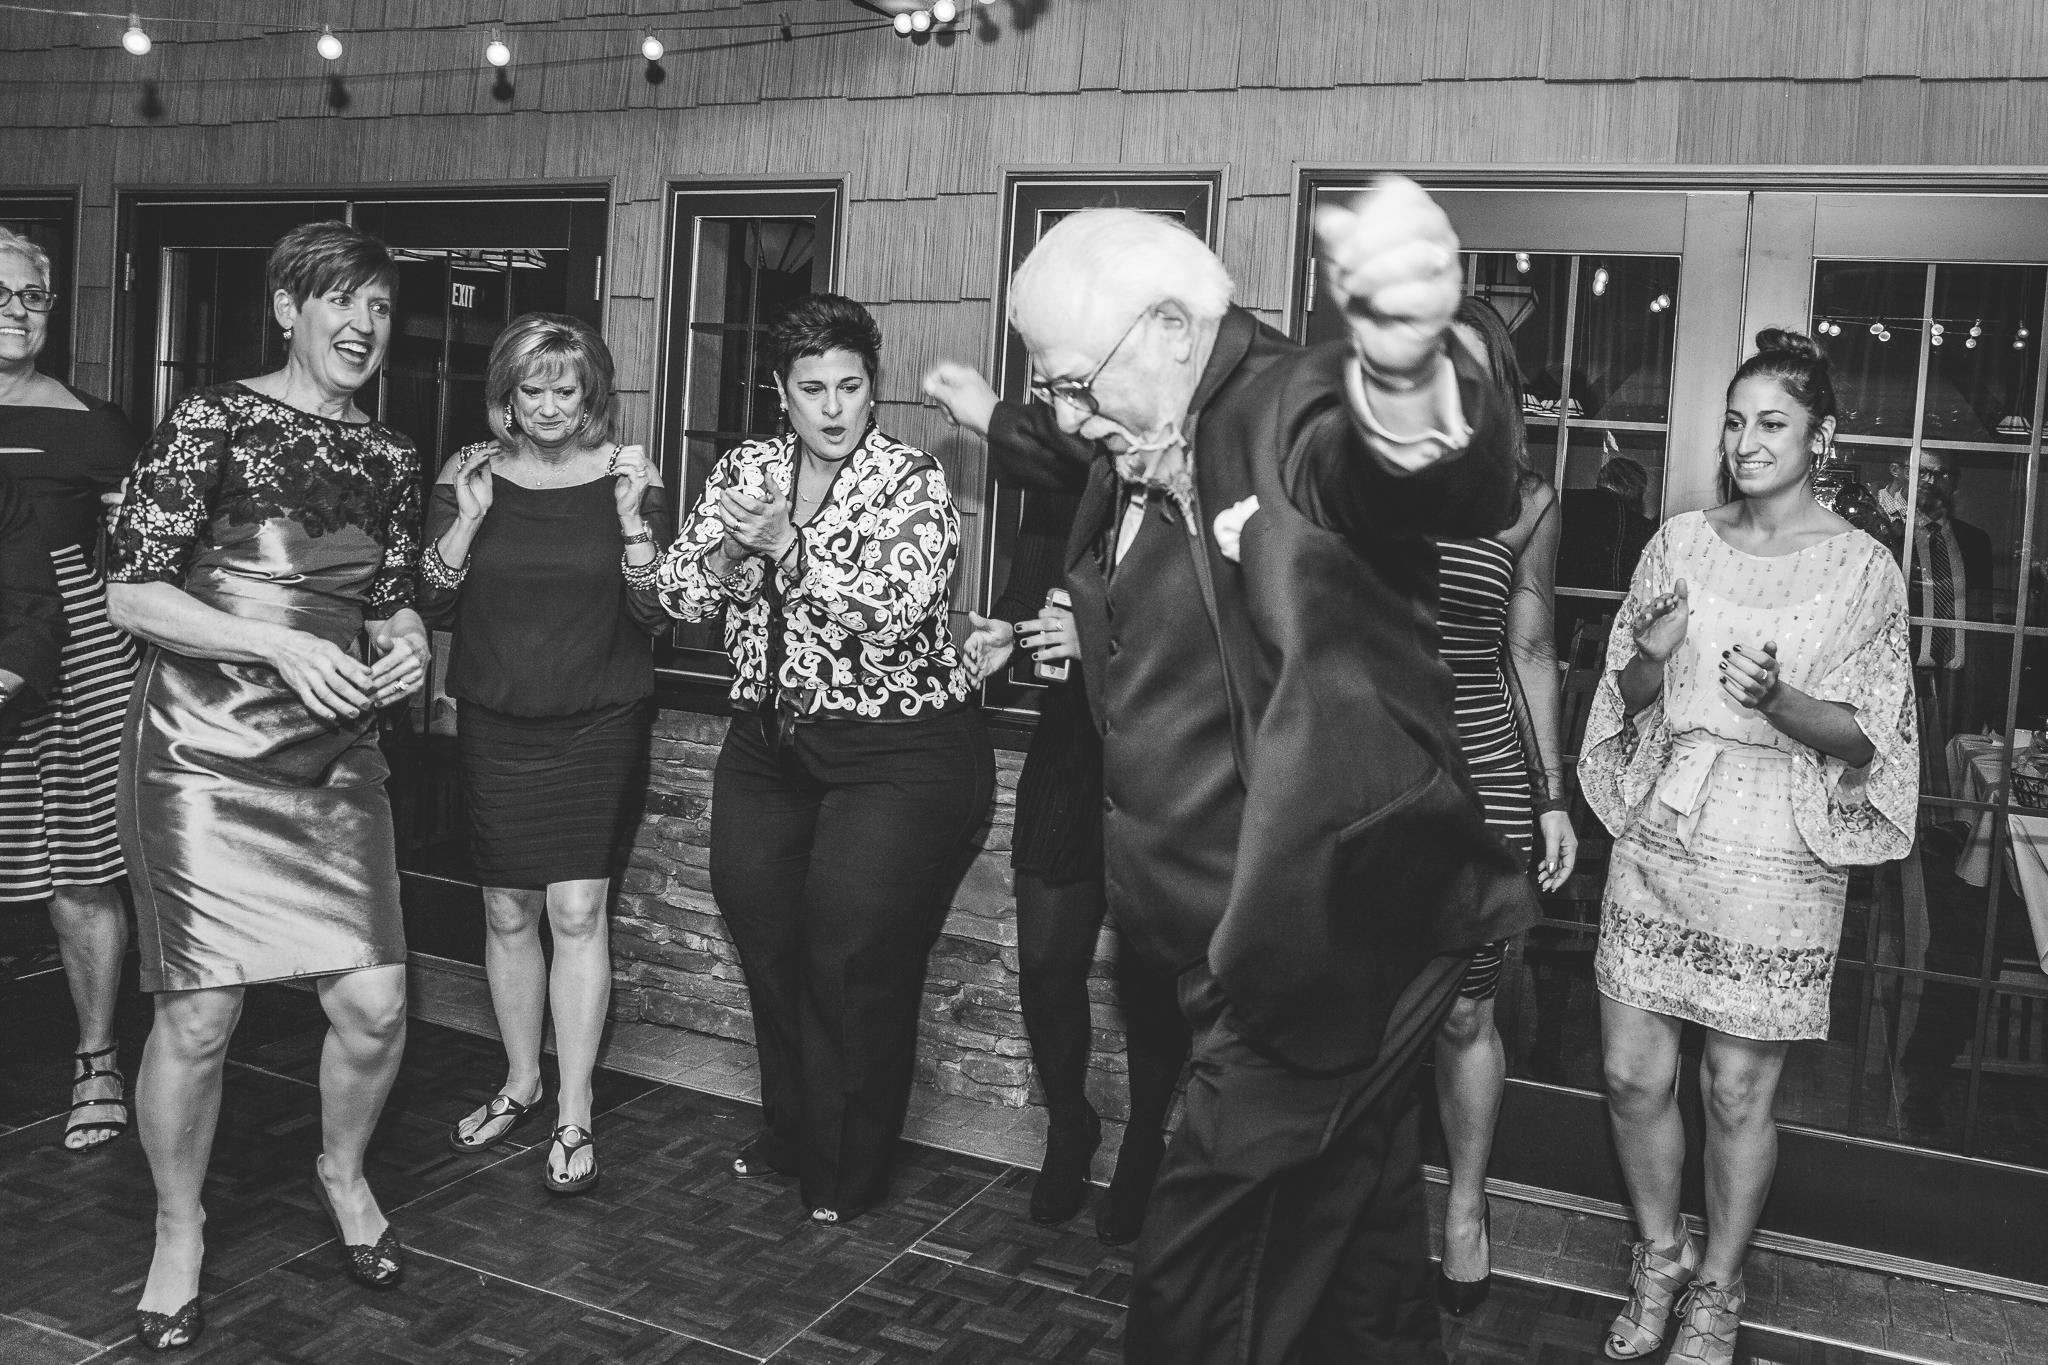 camuglia-whomstudio-chelsea_and_andy-nycphotographer-wedding-brooklyn-buffalo-timberlodge-135-0863.jpg